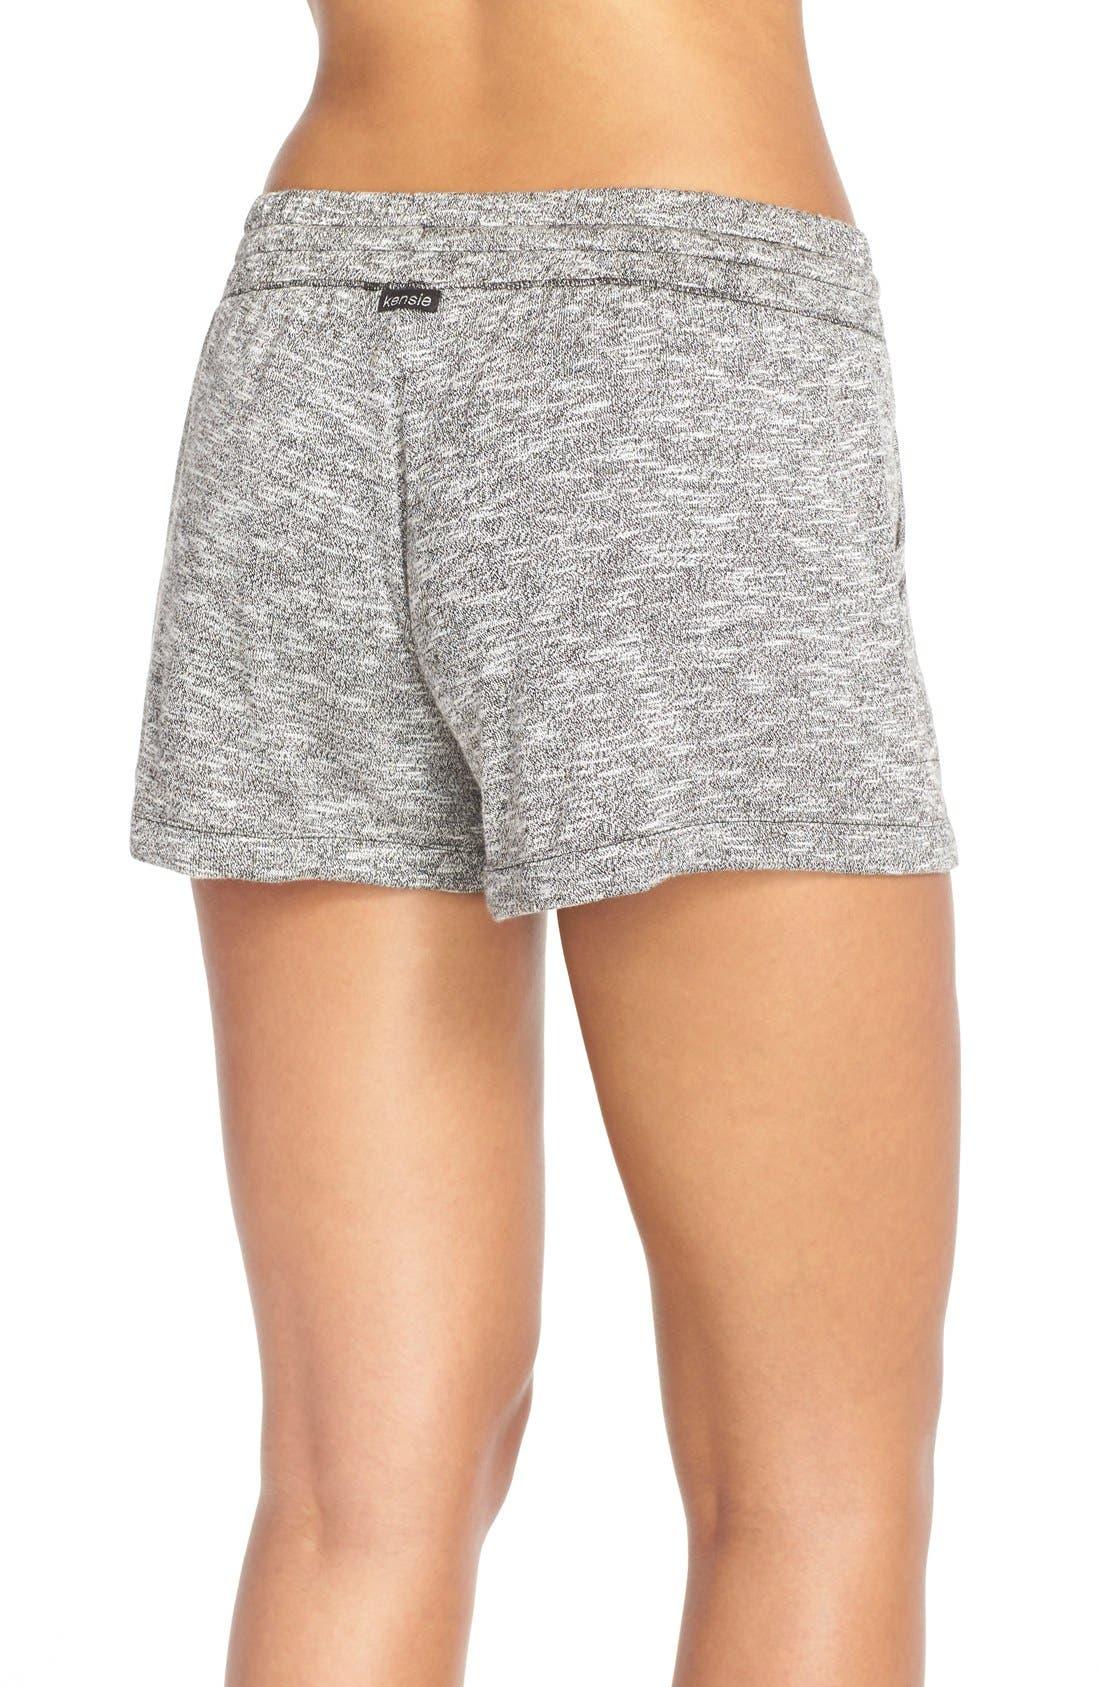 Alternate Image 2  - kensieKnitLounge Shorts